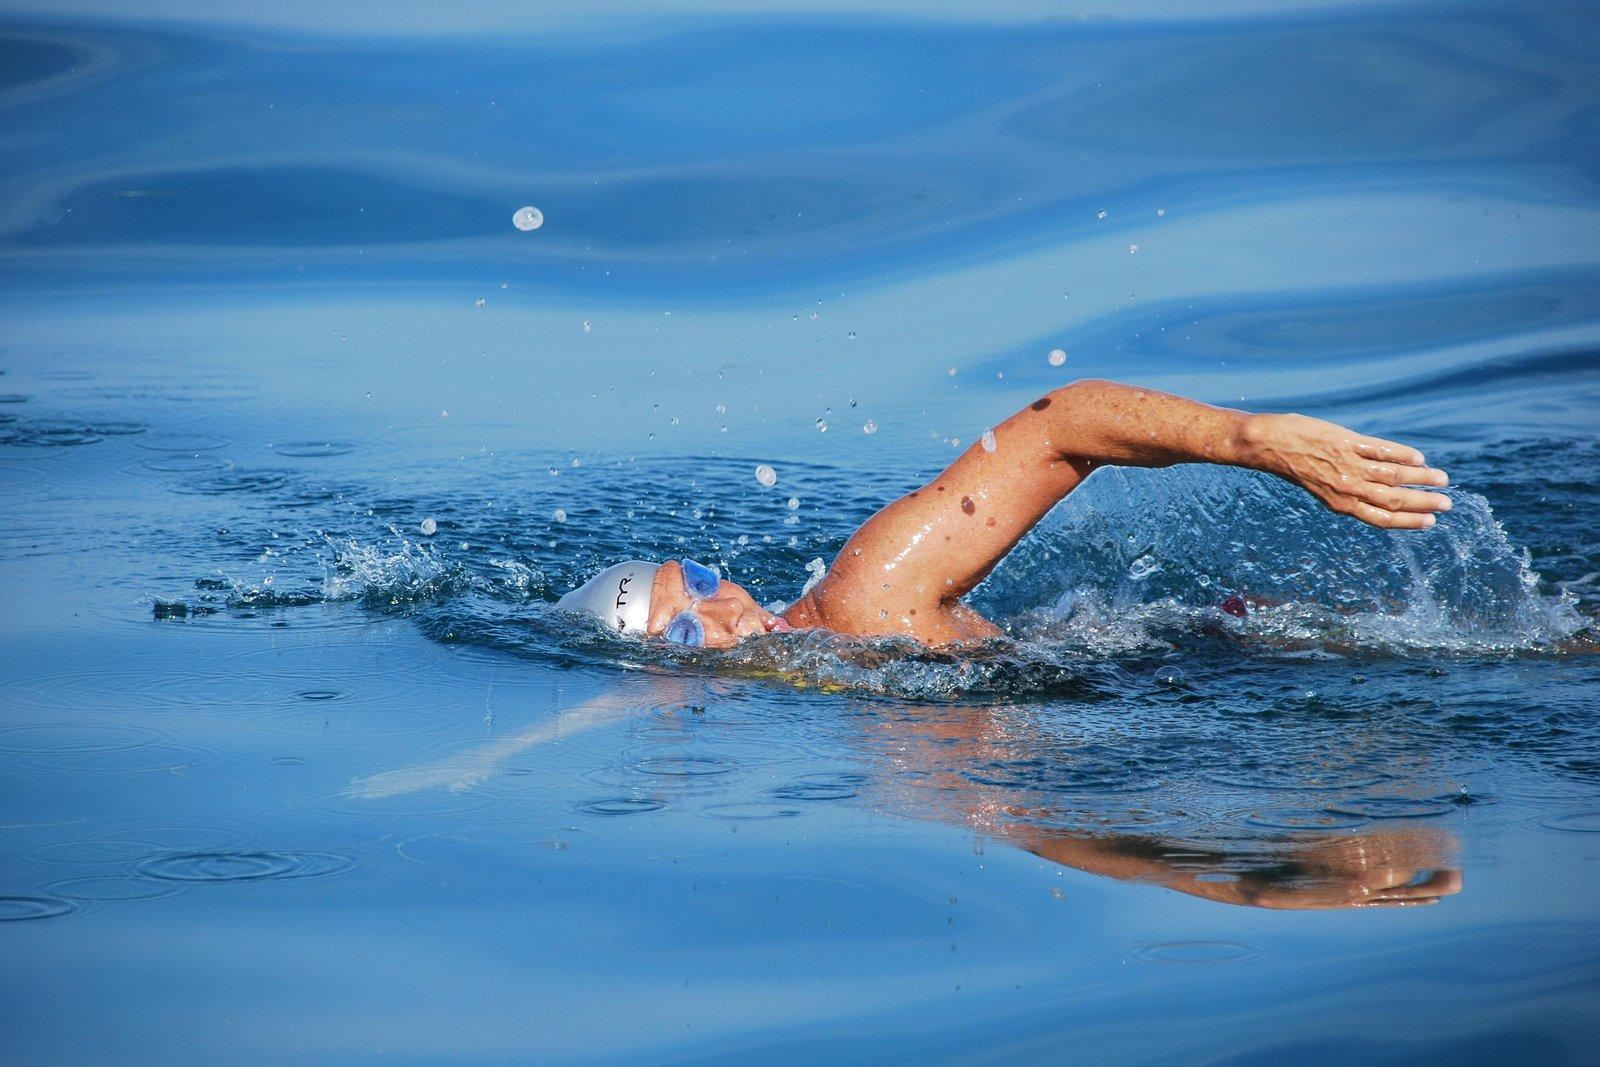 diana-nyad-swam-110-miles-from-cuba-to-florida